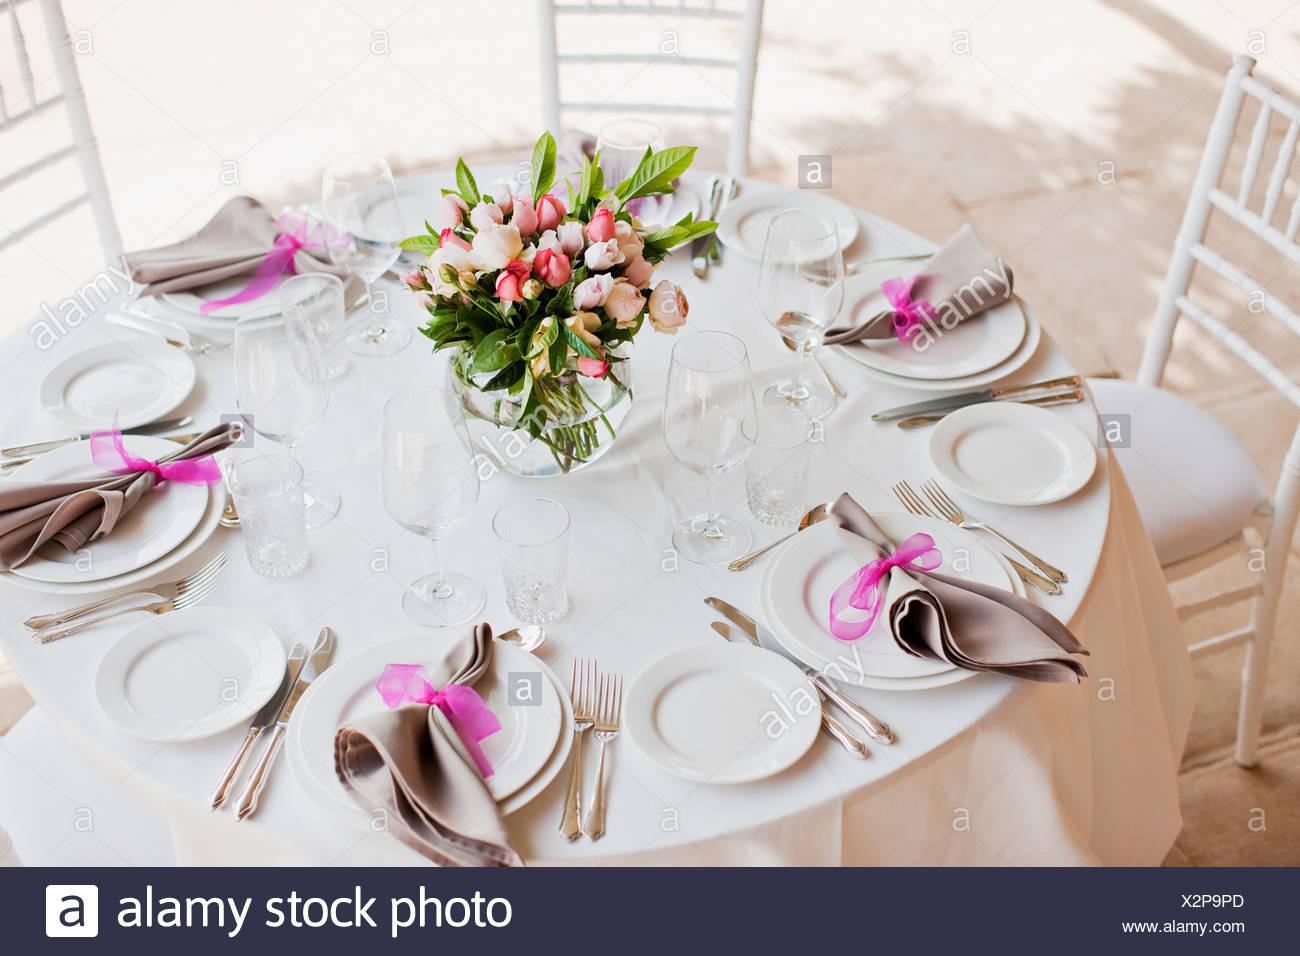 Wedding Reception Table Setting Stock Photos & Wedding Reception ...